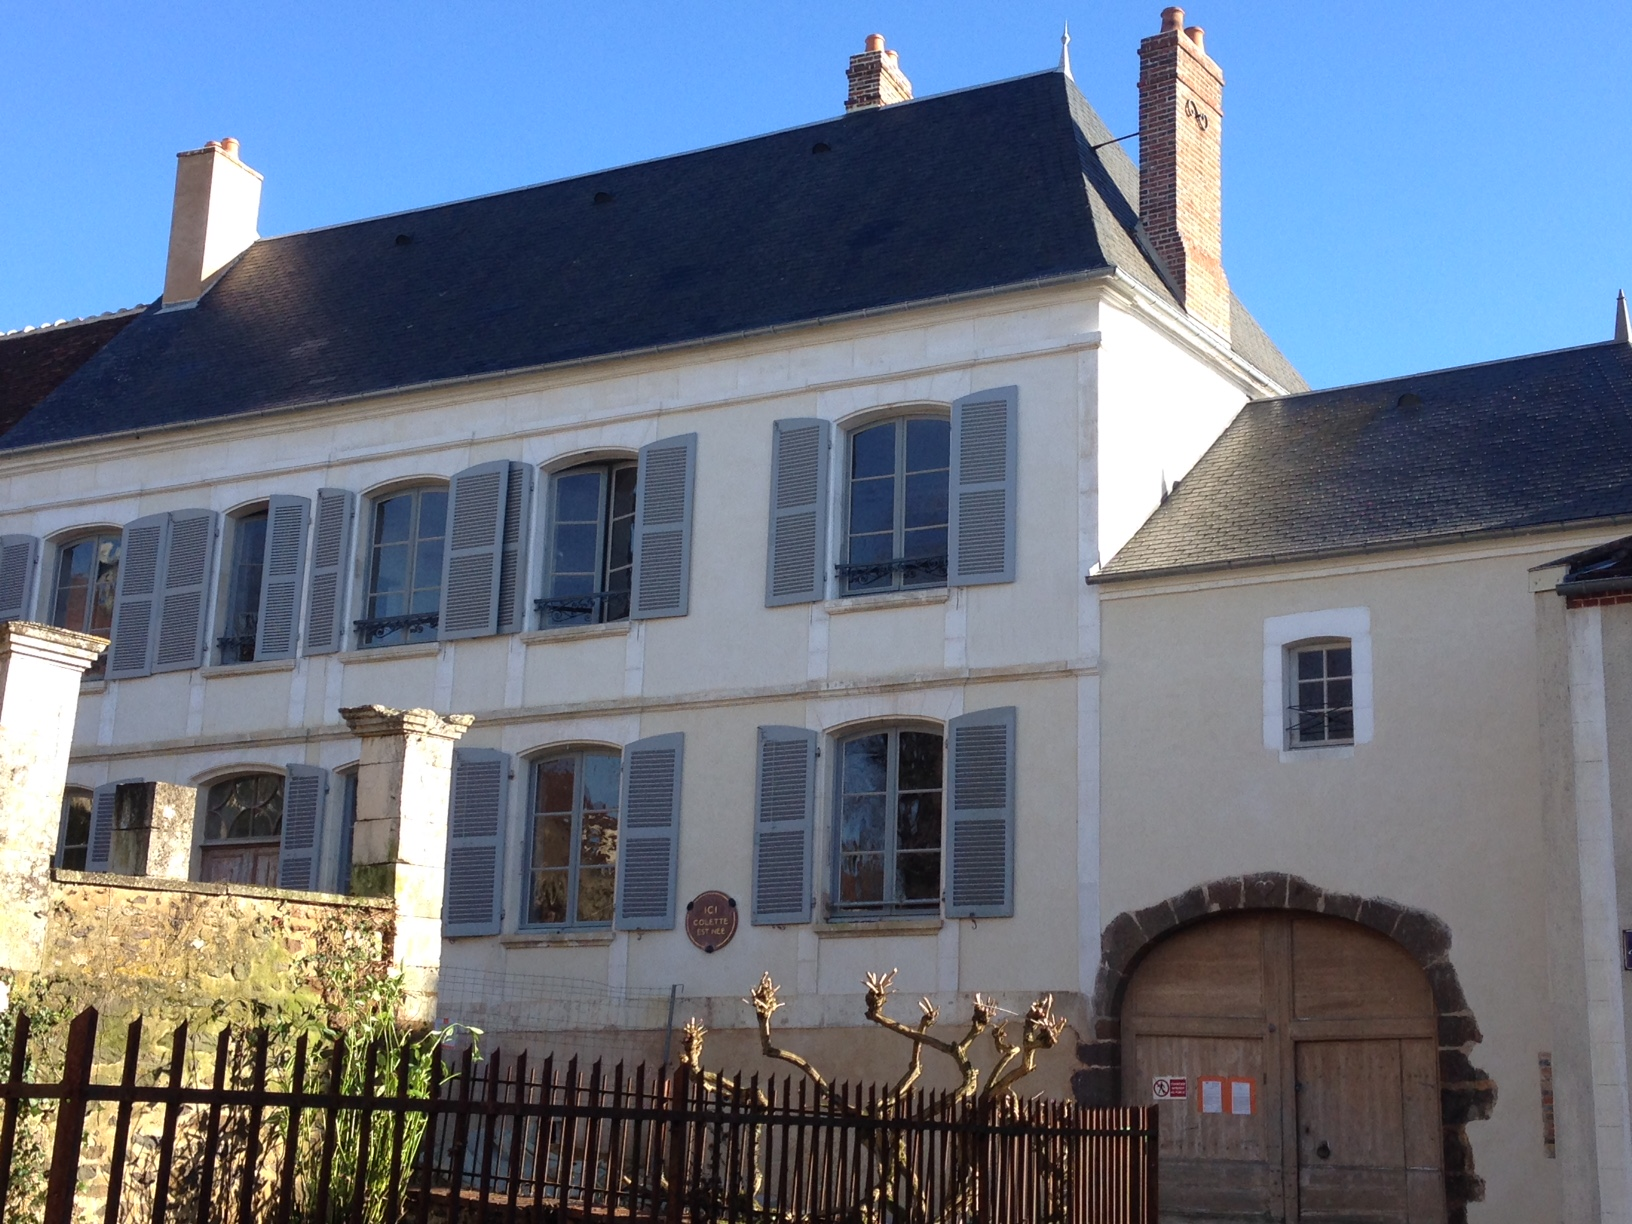 Datei:Facade maison de colette DR.jpg – Wikipedia